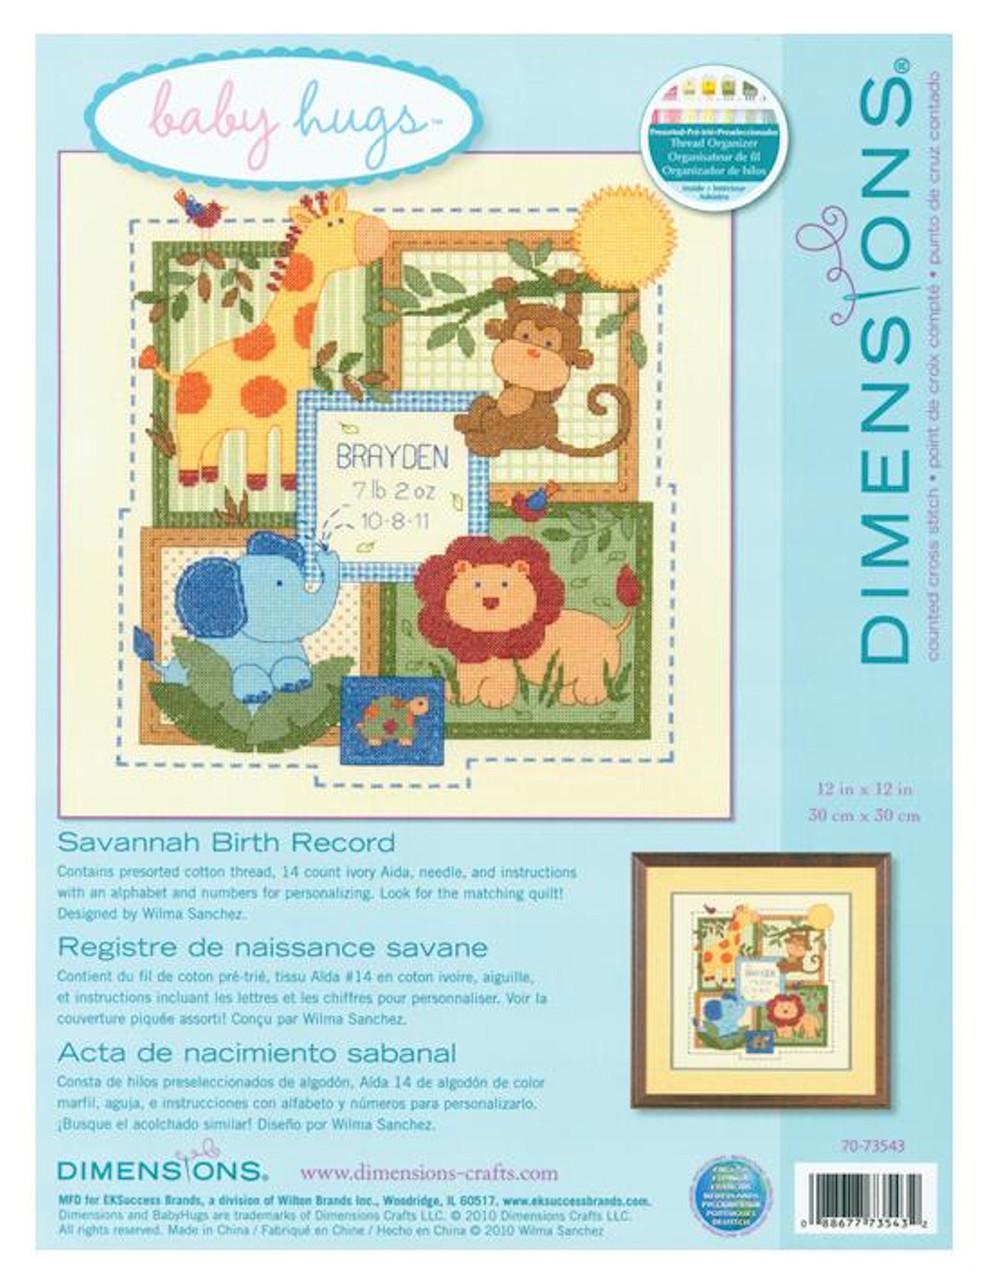 Dimensions Baby Hugs - Savannah Birth Record